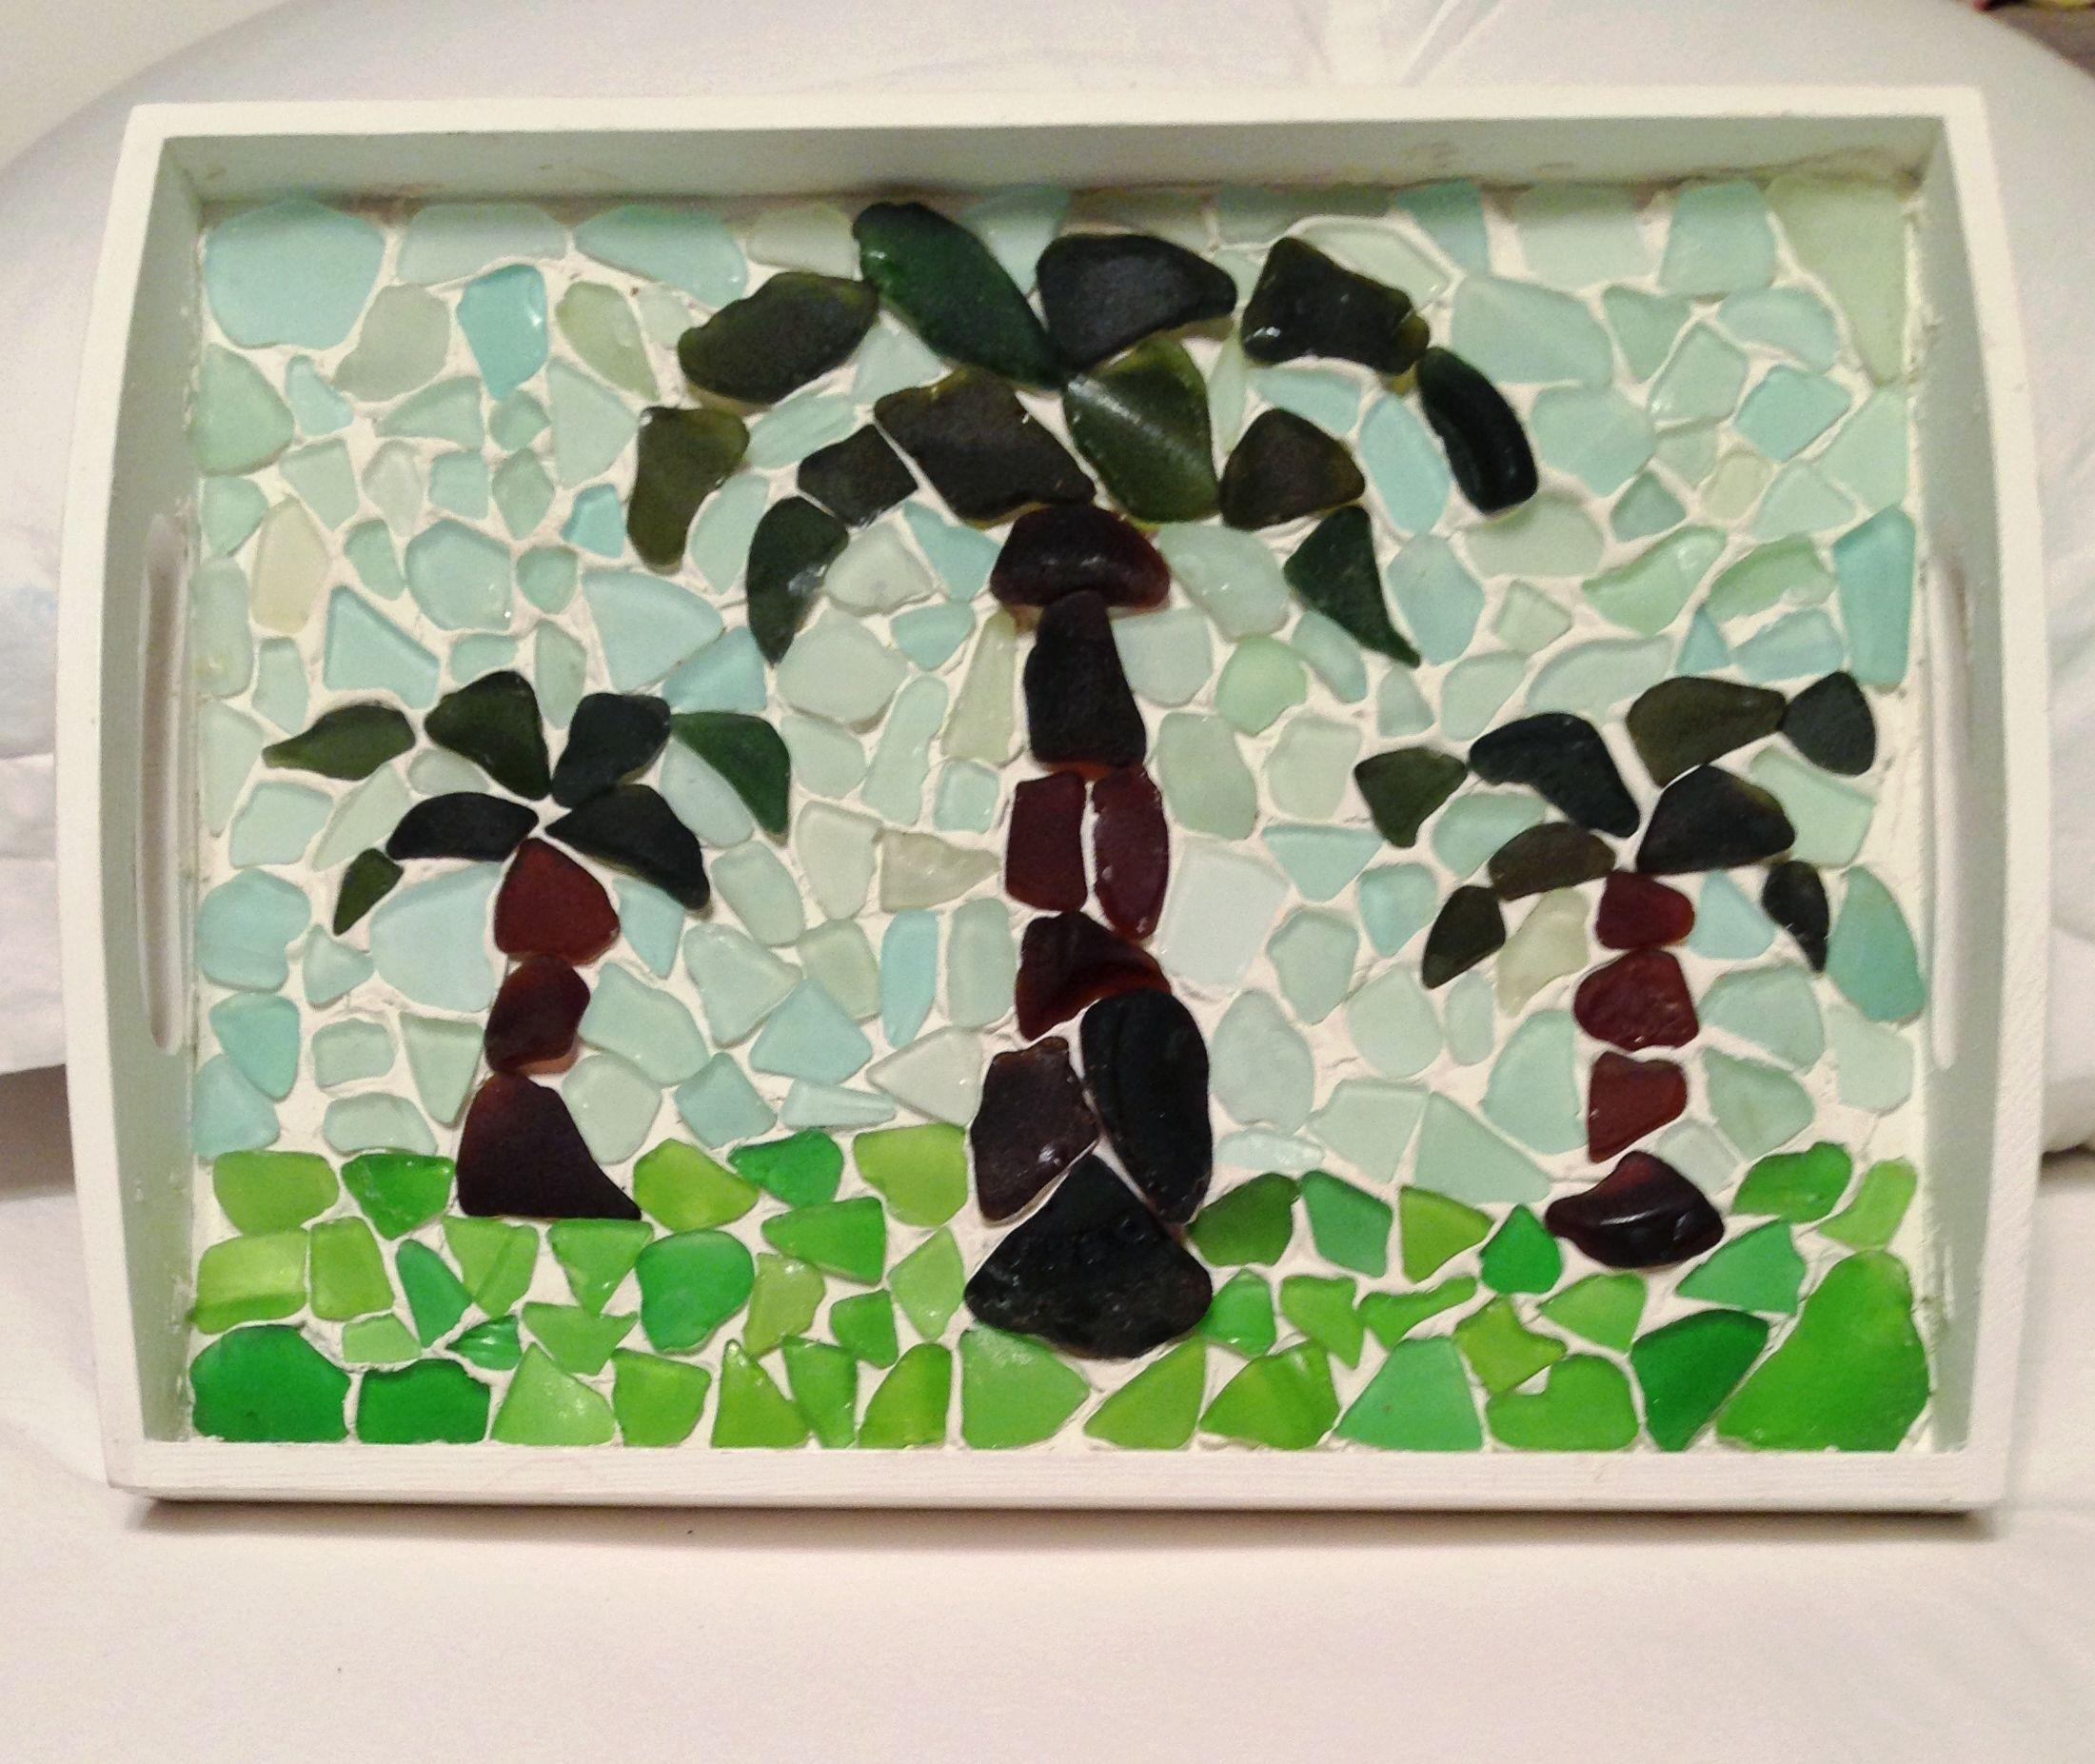 Palm tree mosaic tray I made with sea glass my family and I found ...